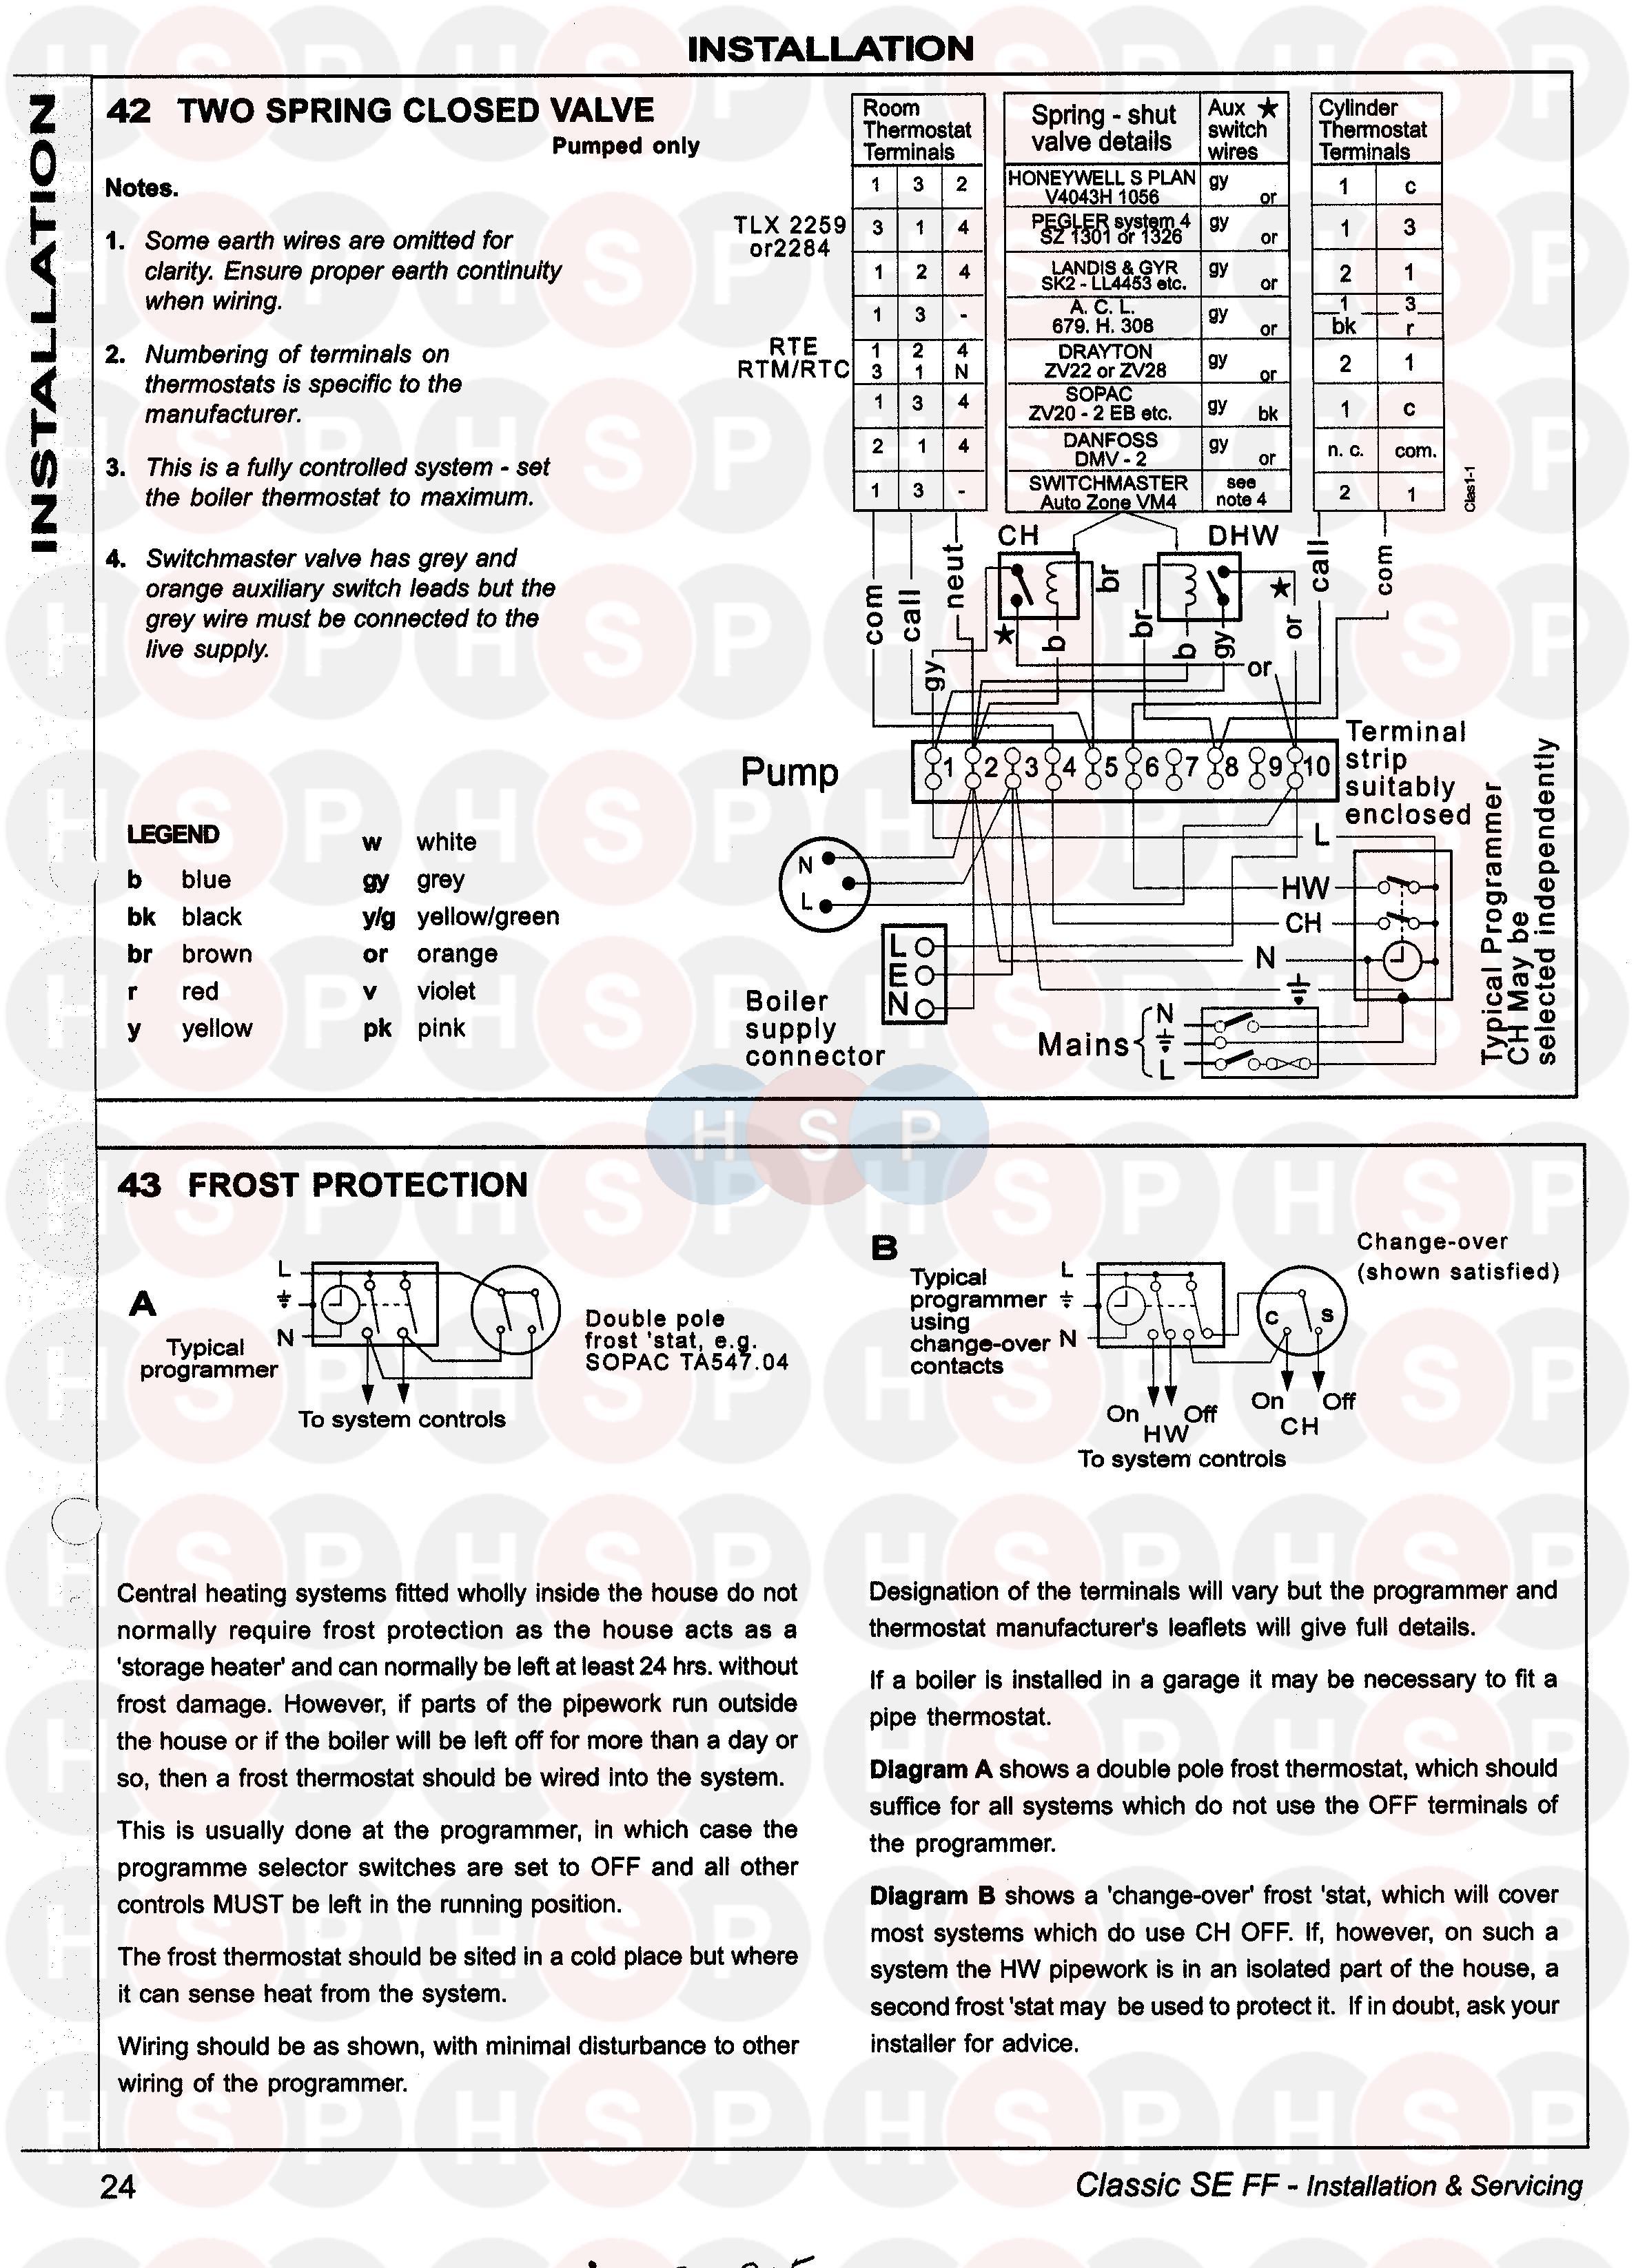 Ideal Classic Se24 Ff  Wiring Diagram 2 Diagram